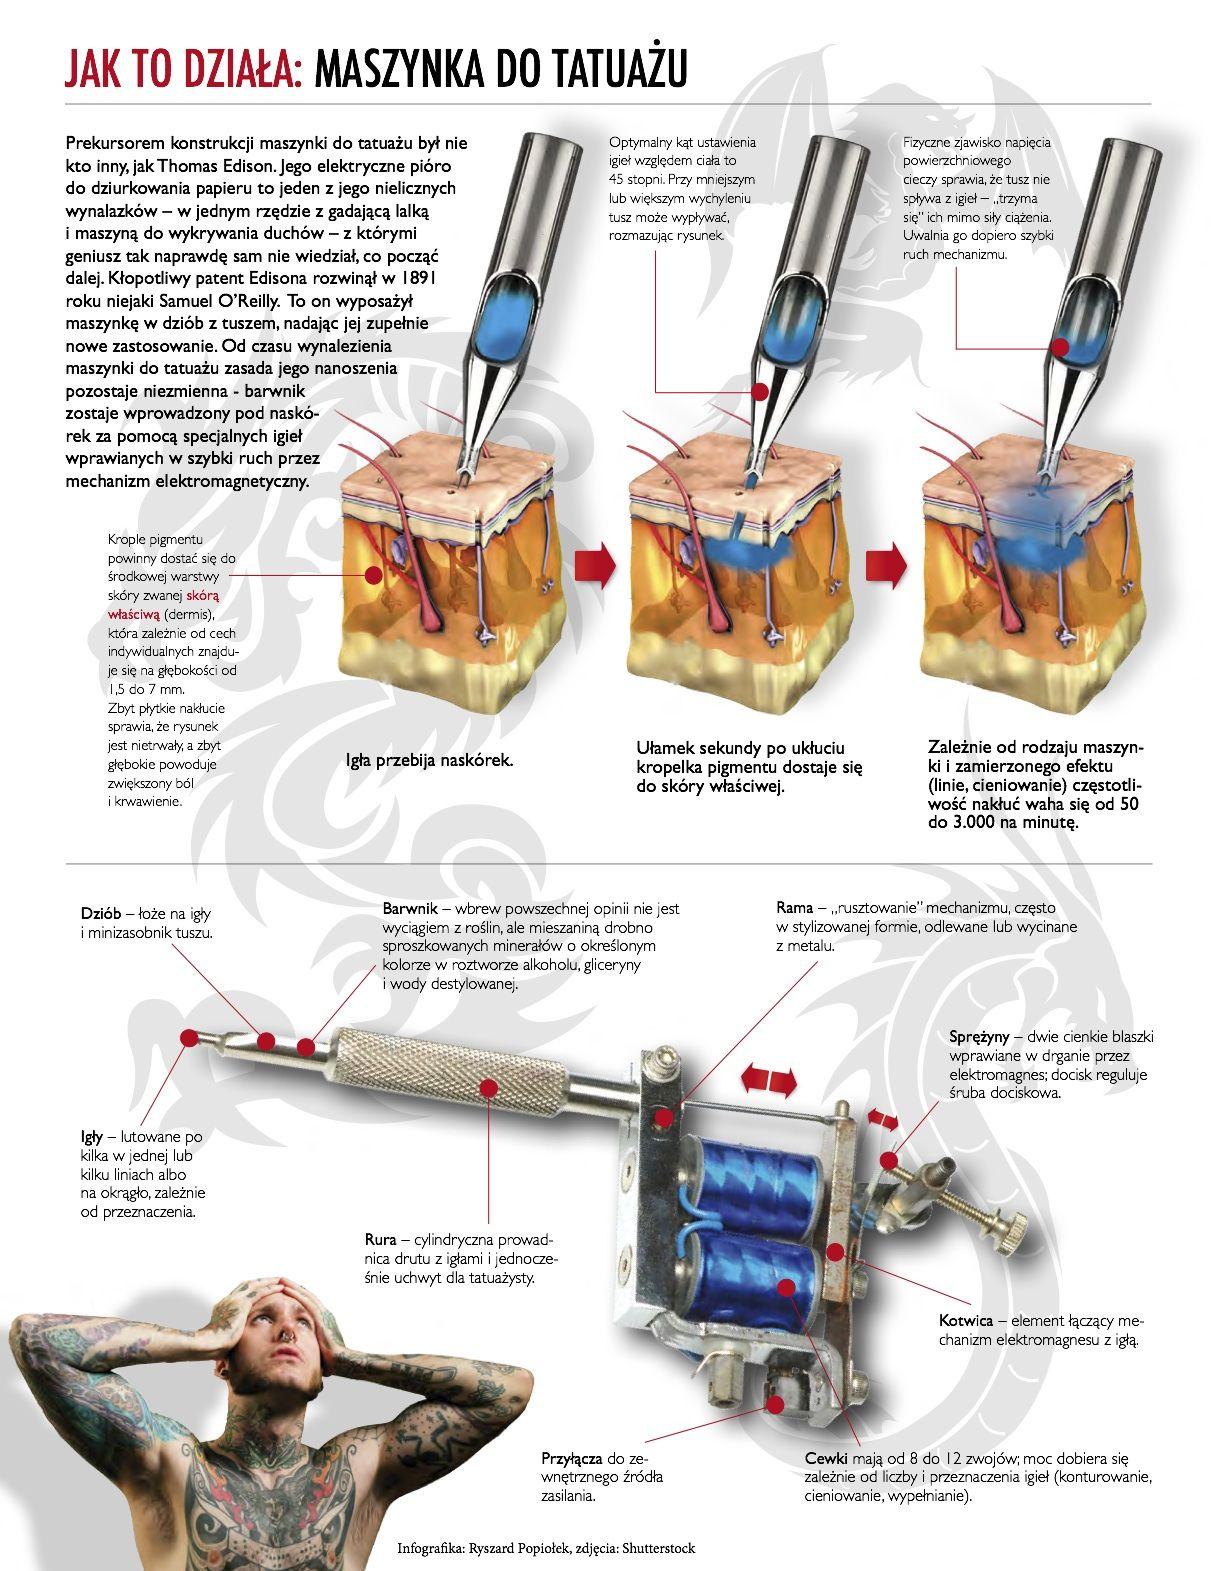 Infographics: how do tattoo machines work. Anatomy of a tattoo ...